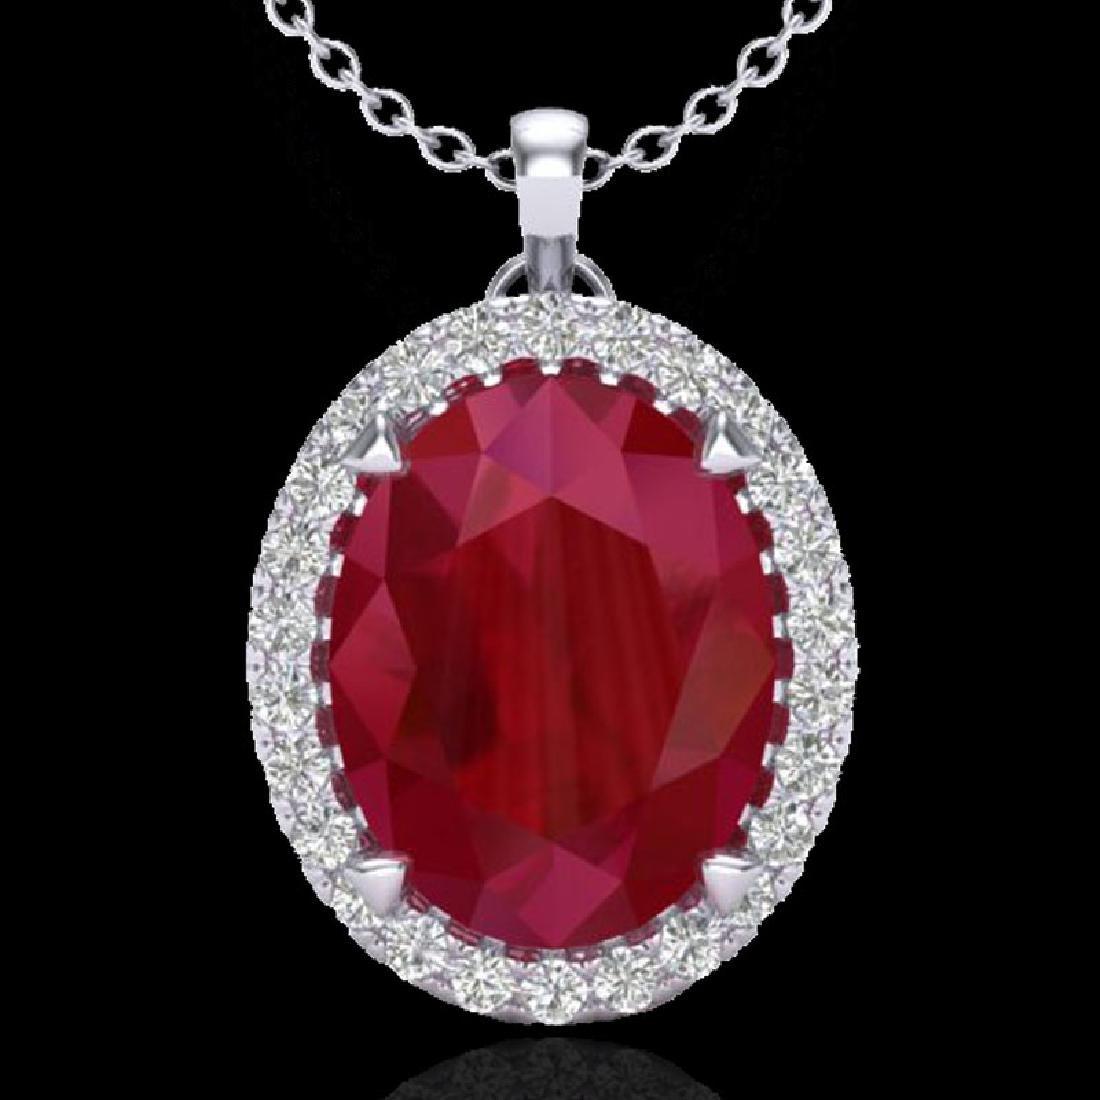 2.75 CTW Ruby & Micro VS/SI Diamond Halo Necklace 18K